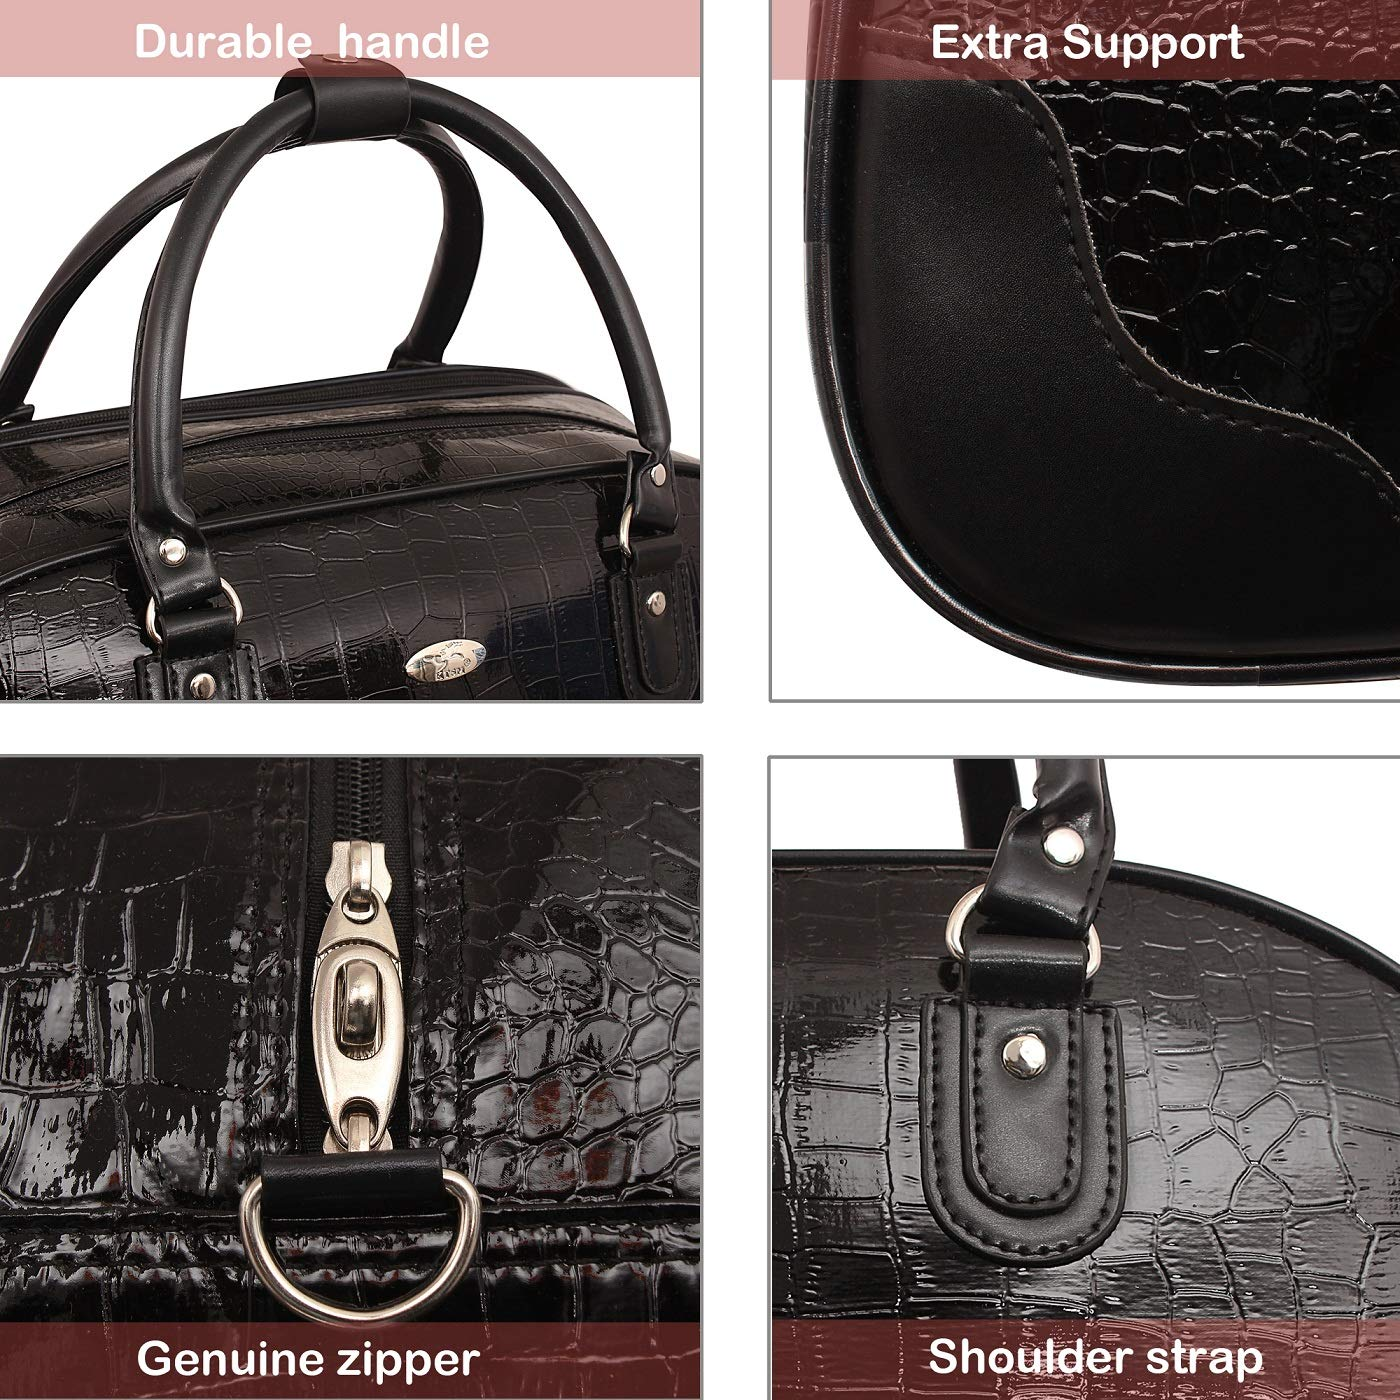 387934ec61 kézitáska Women s Synthetic Top Handle Travel Duffle Bag (Black)   Amazon.in  Bags